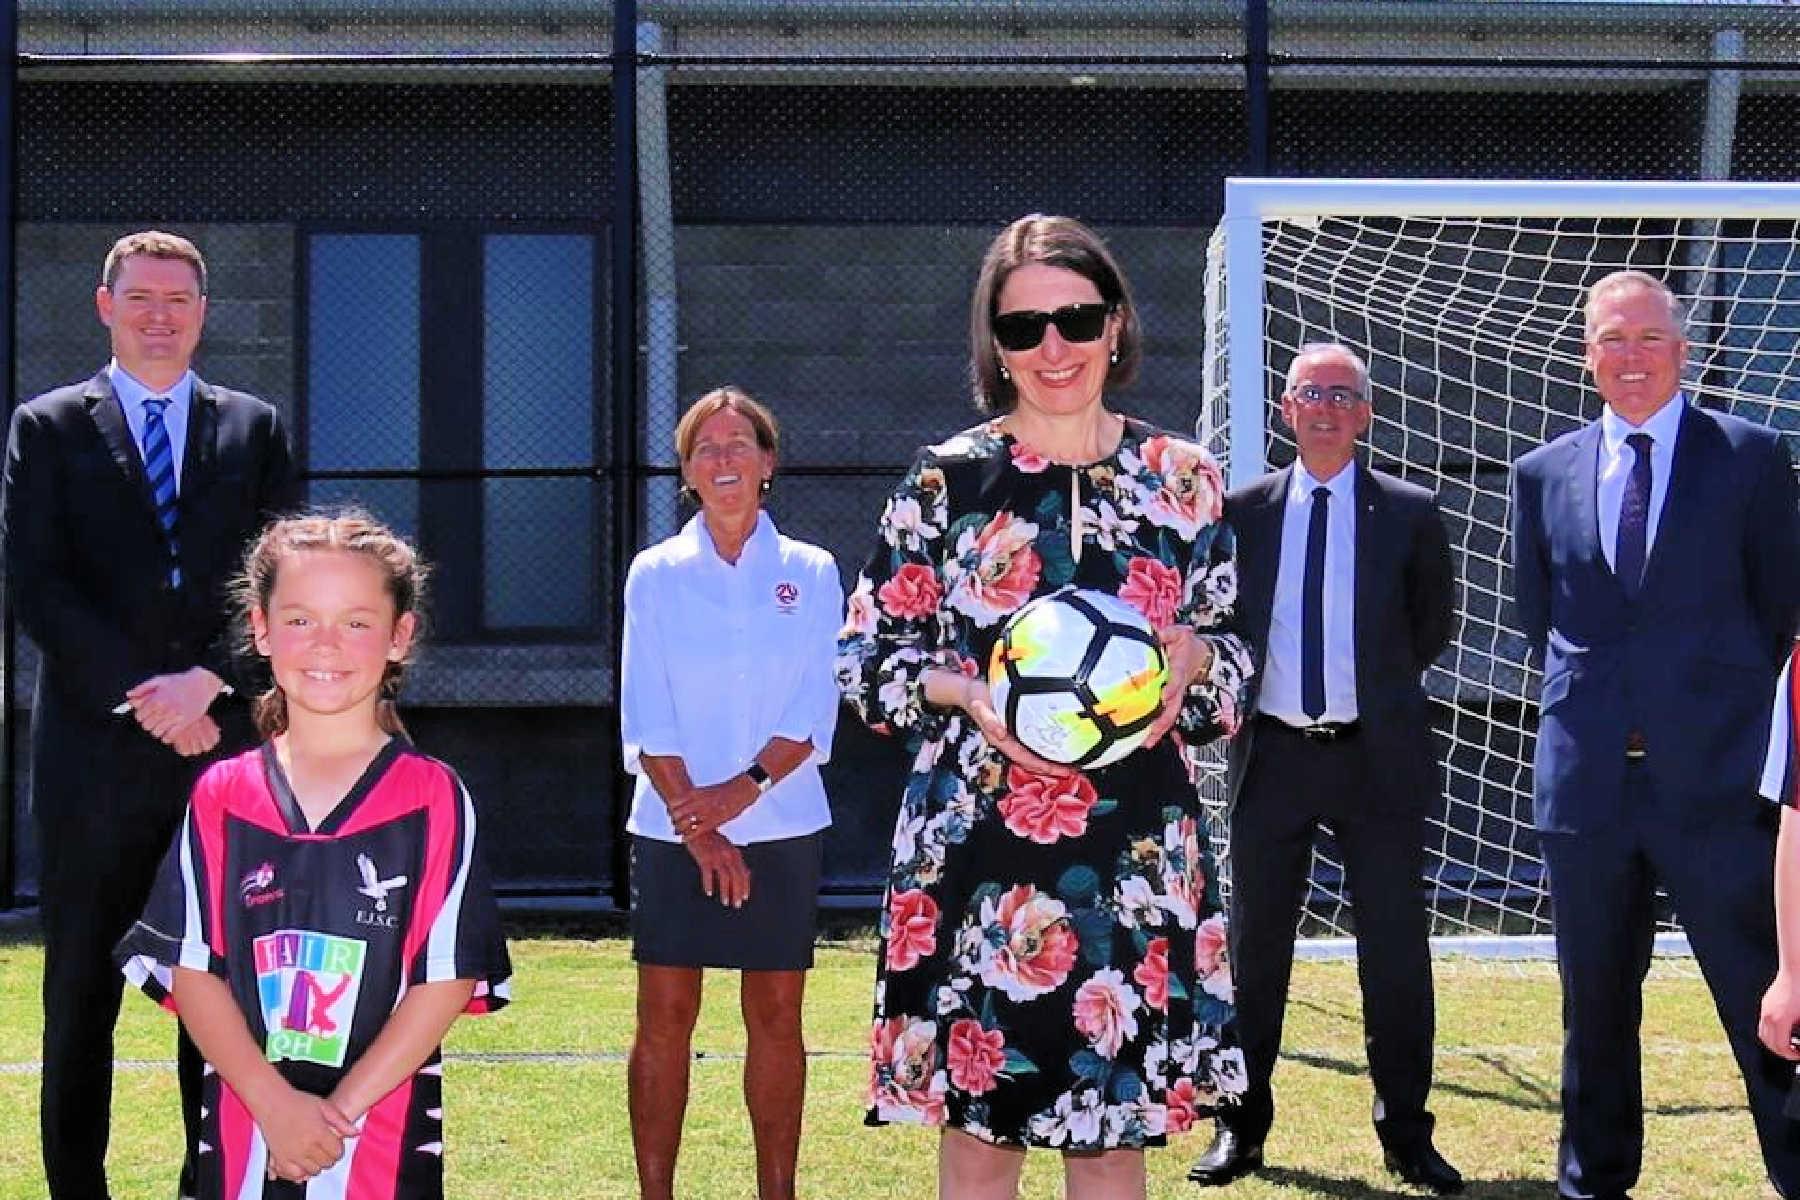 Gladys-Berejiklian-northern-nsw-football